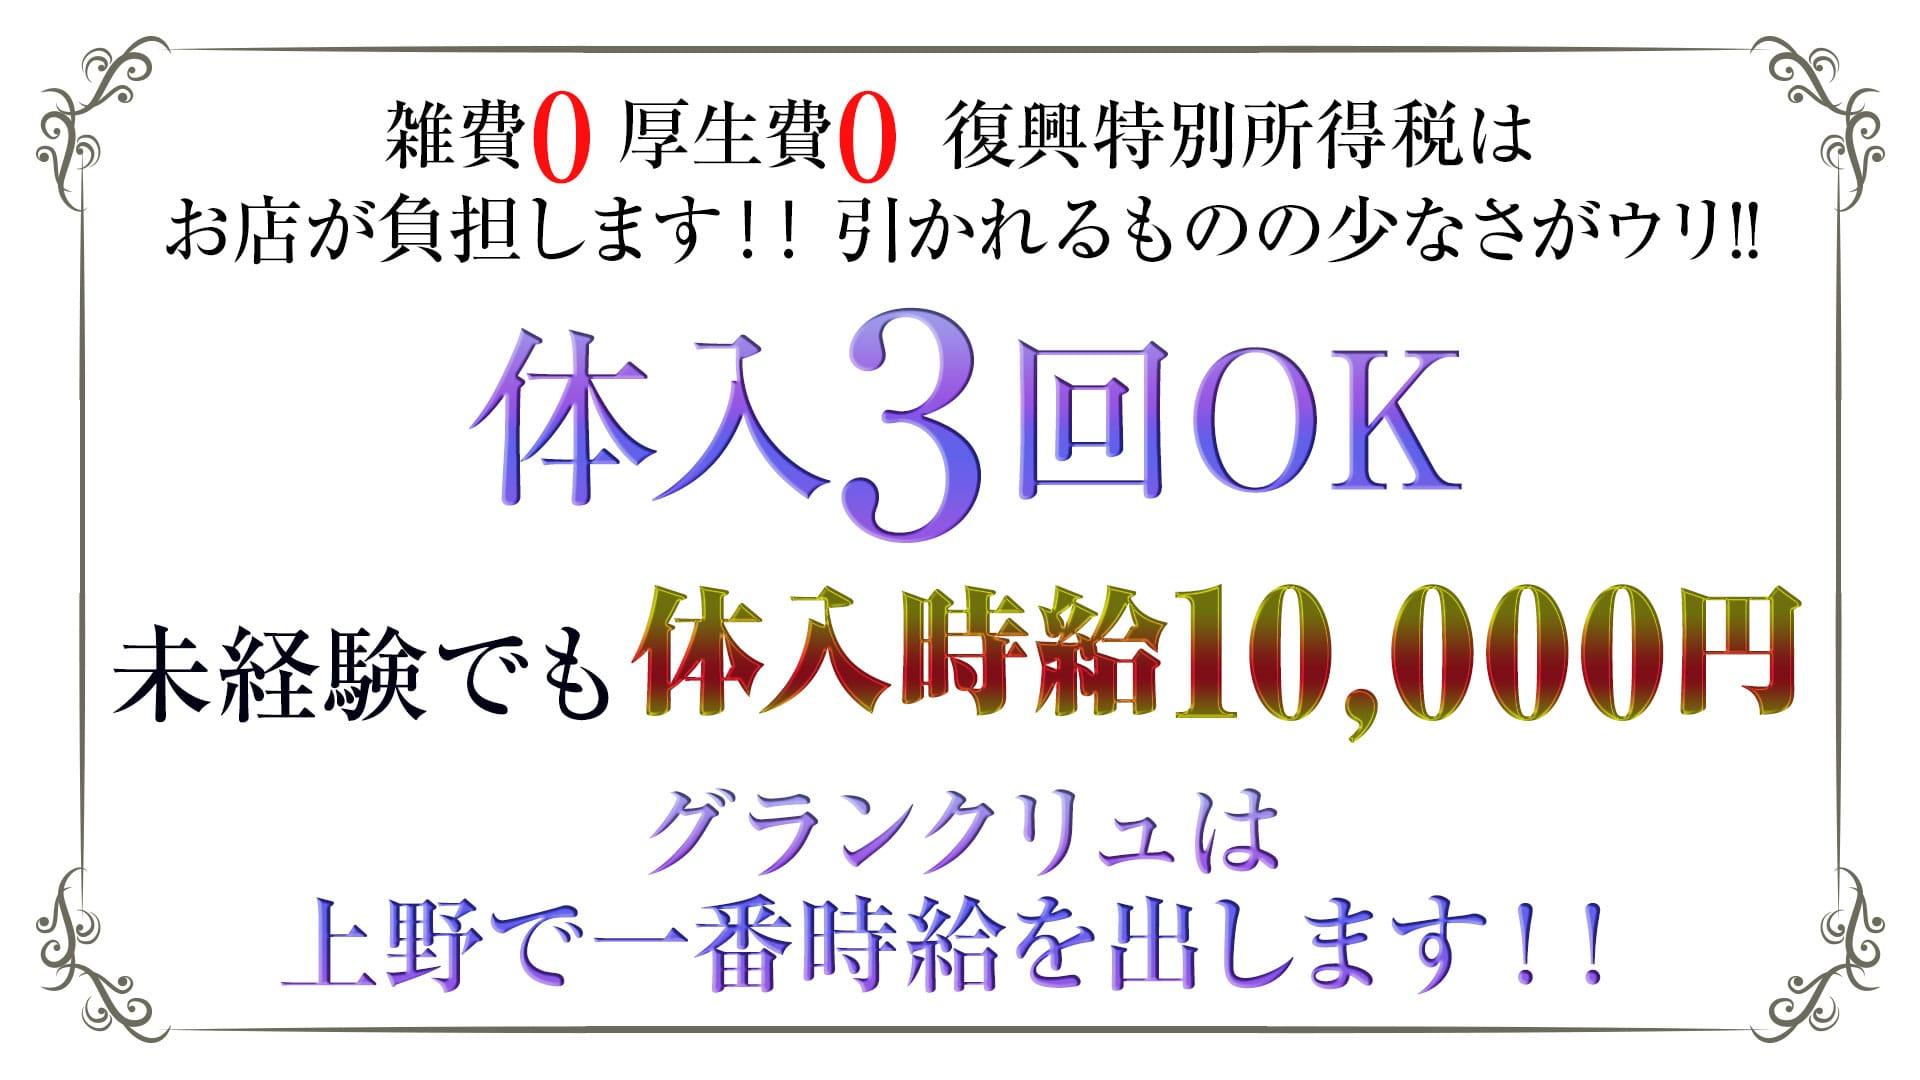 GRAND CRU(グランクリュ) 上野キャバクラ TOP画像